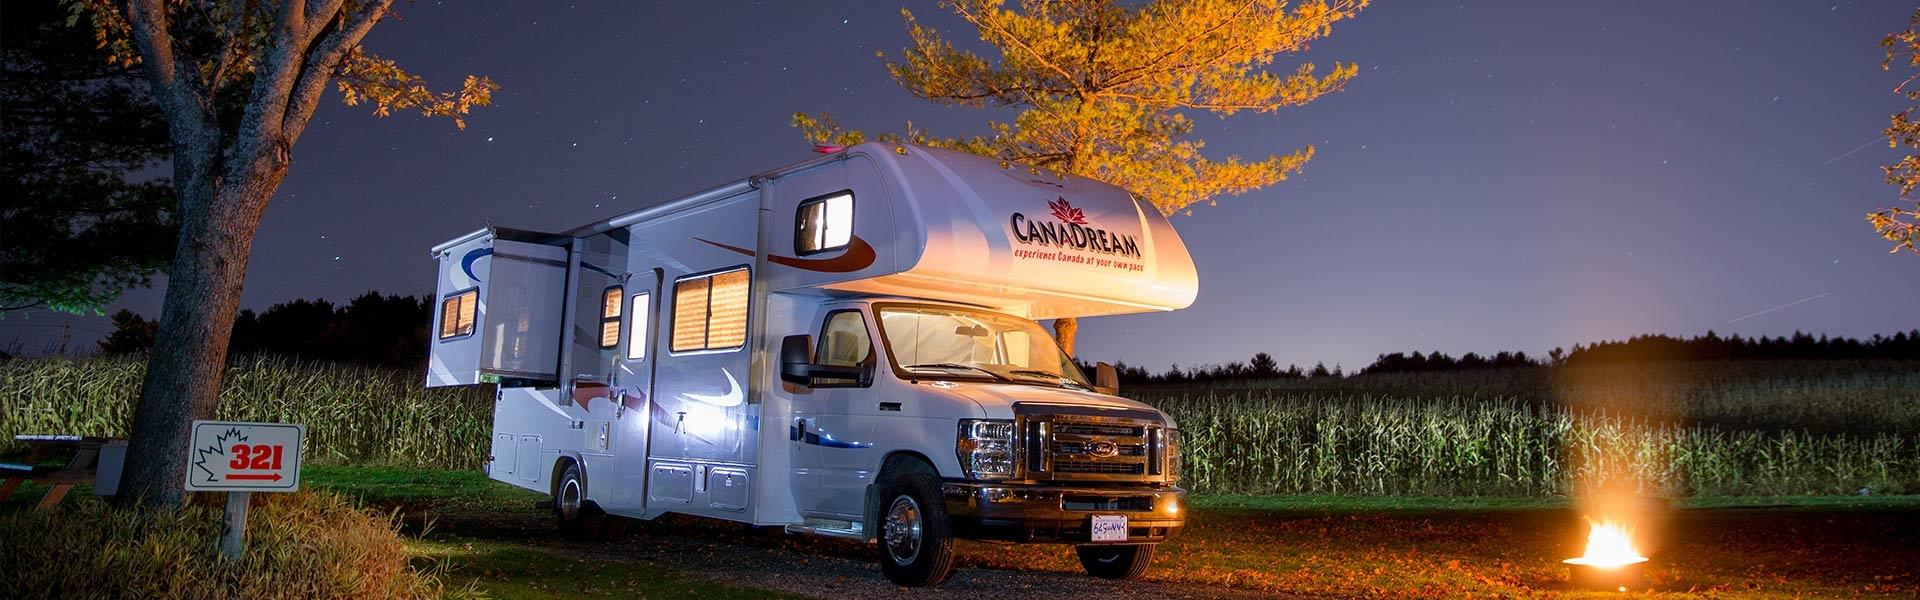 RV Trips Across Canada